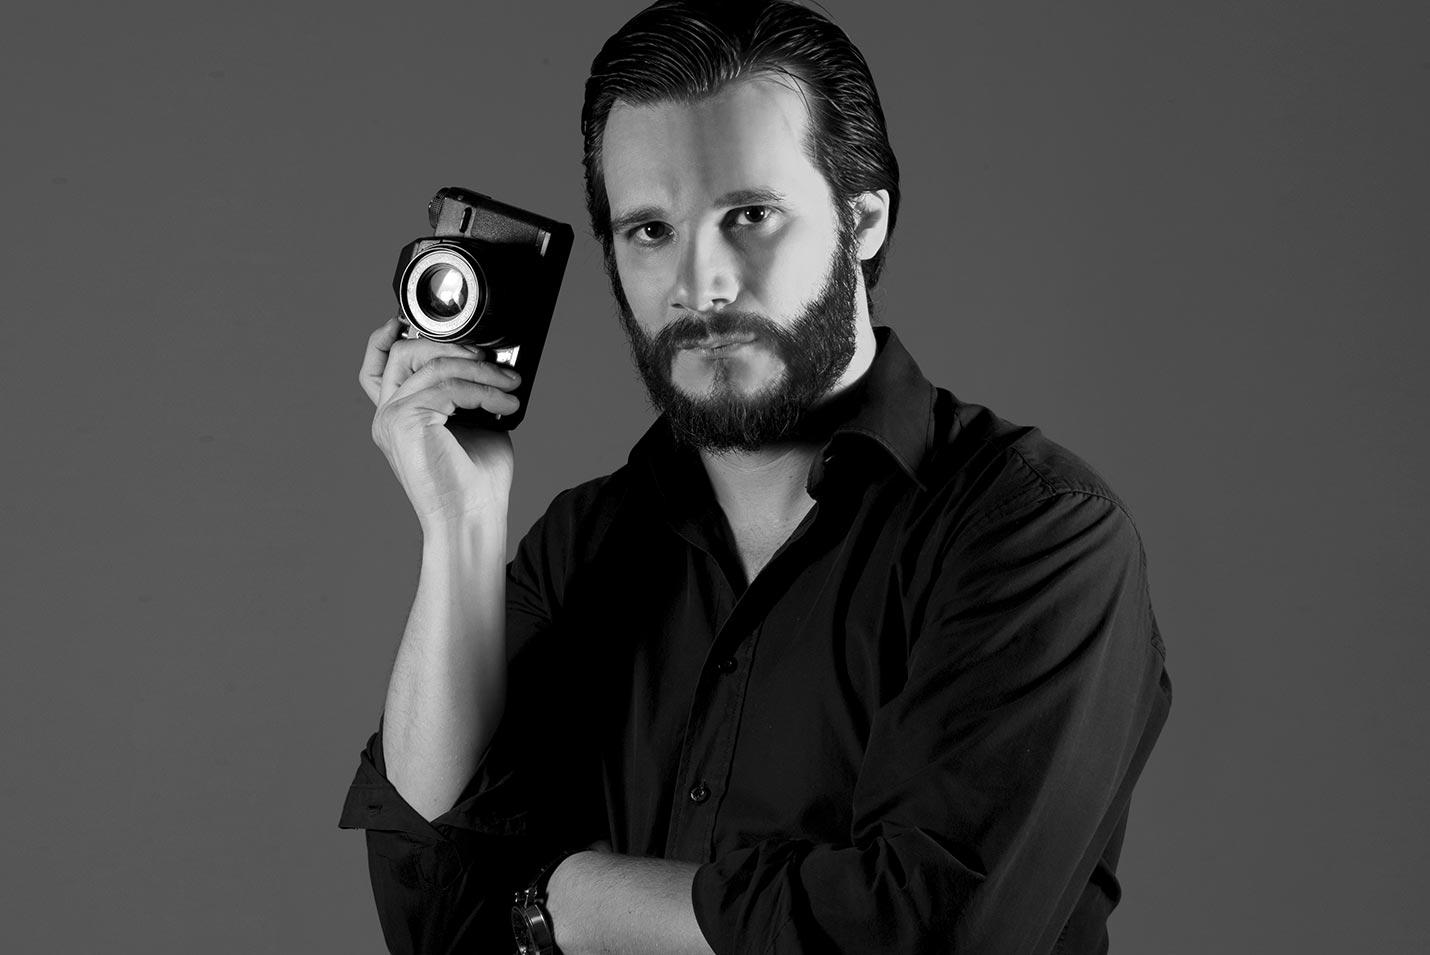 Fotógrafo Thiago Sapienza